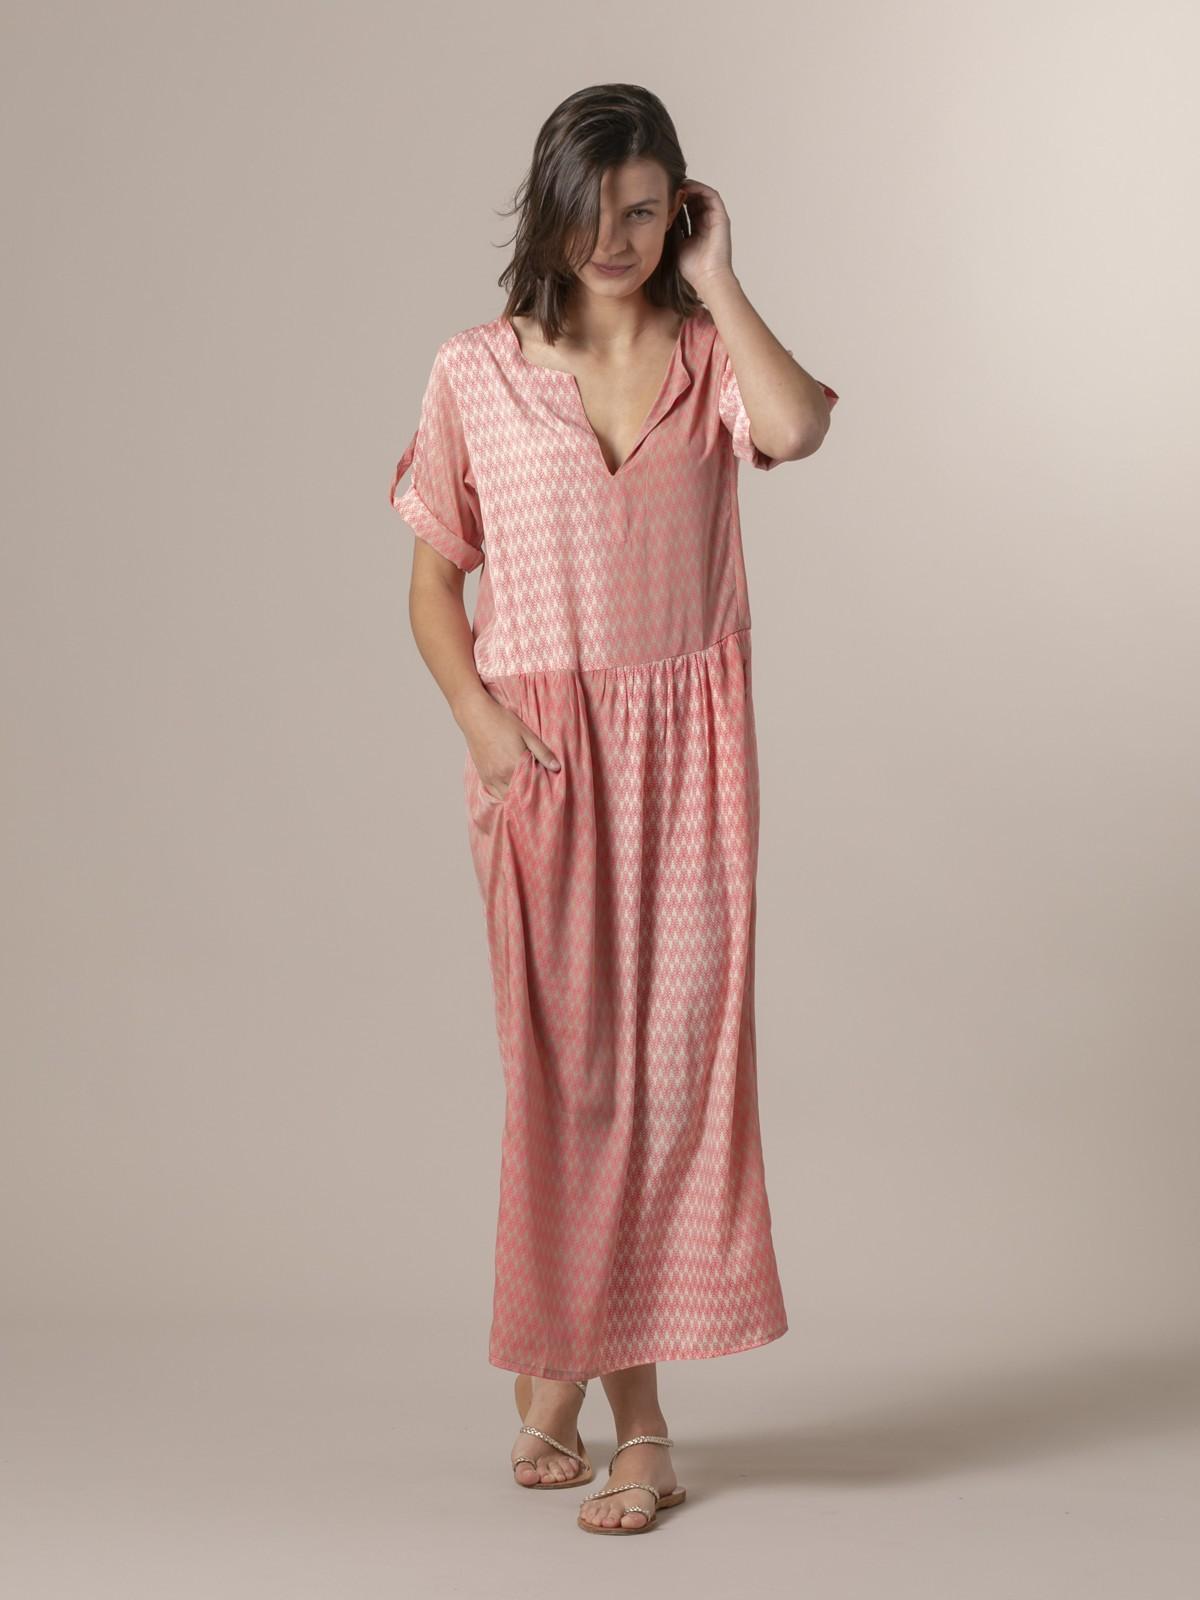 Woman Woman Long flowing dress Pinks